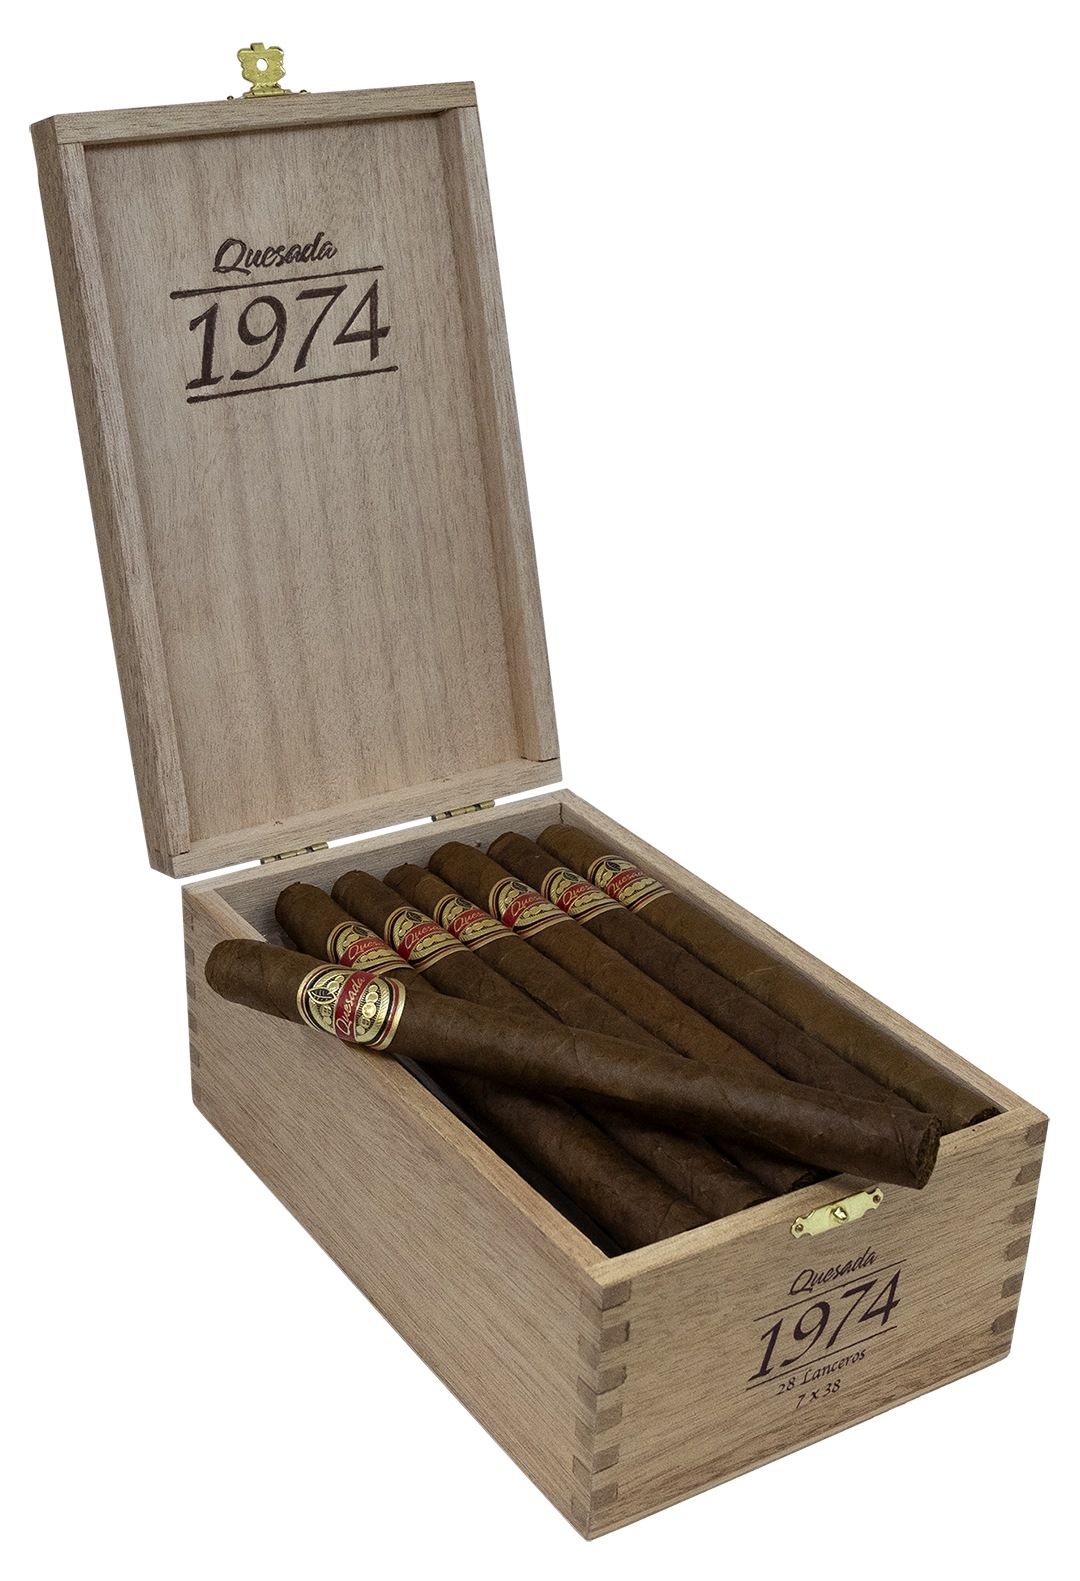 Quesada 1974 box open